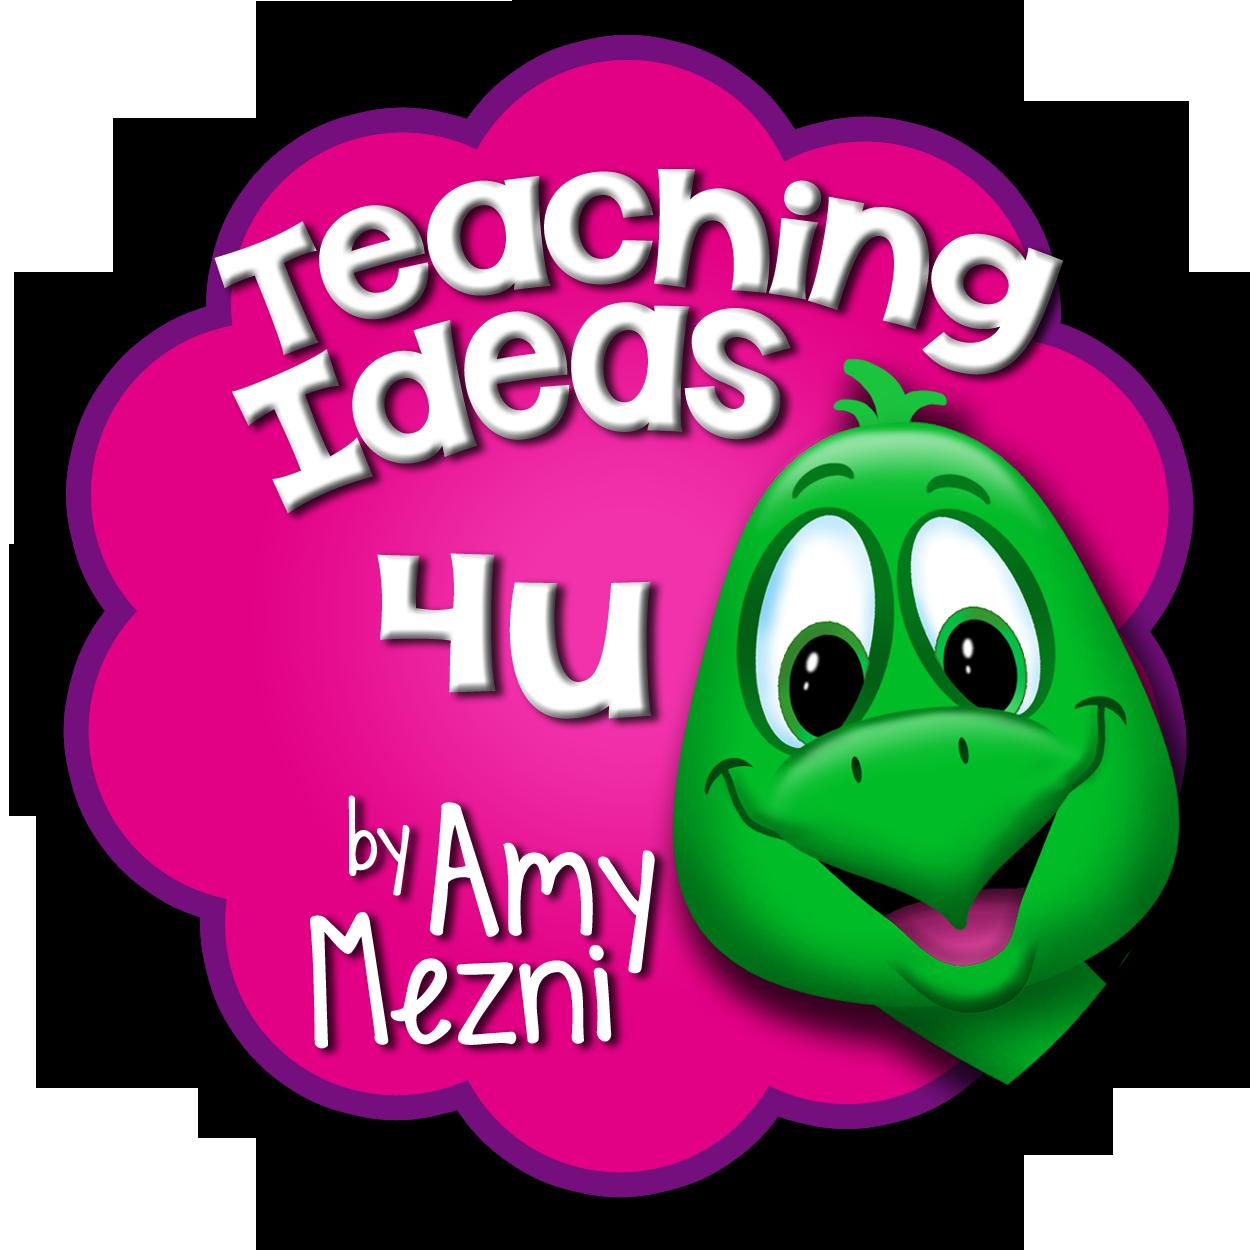 Amy_Mezni_Logo_f_Updated_9-27-14